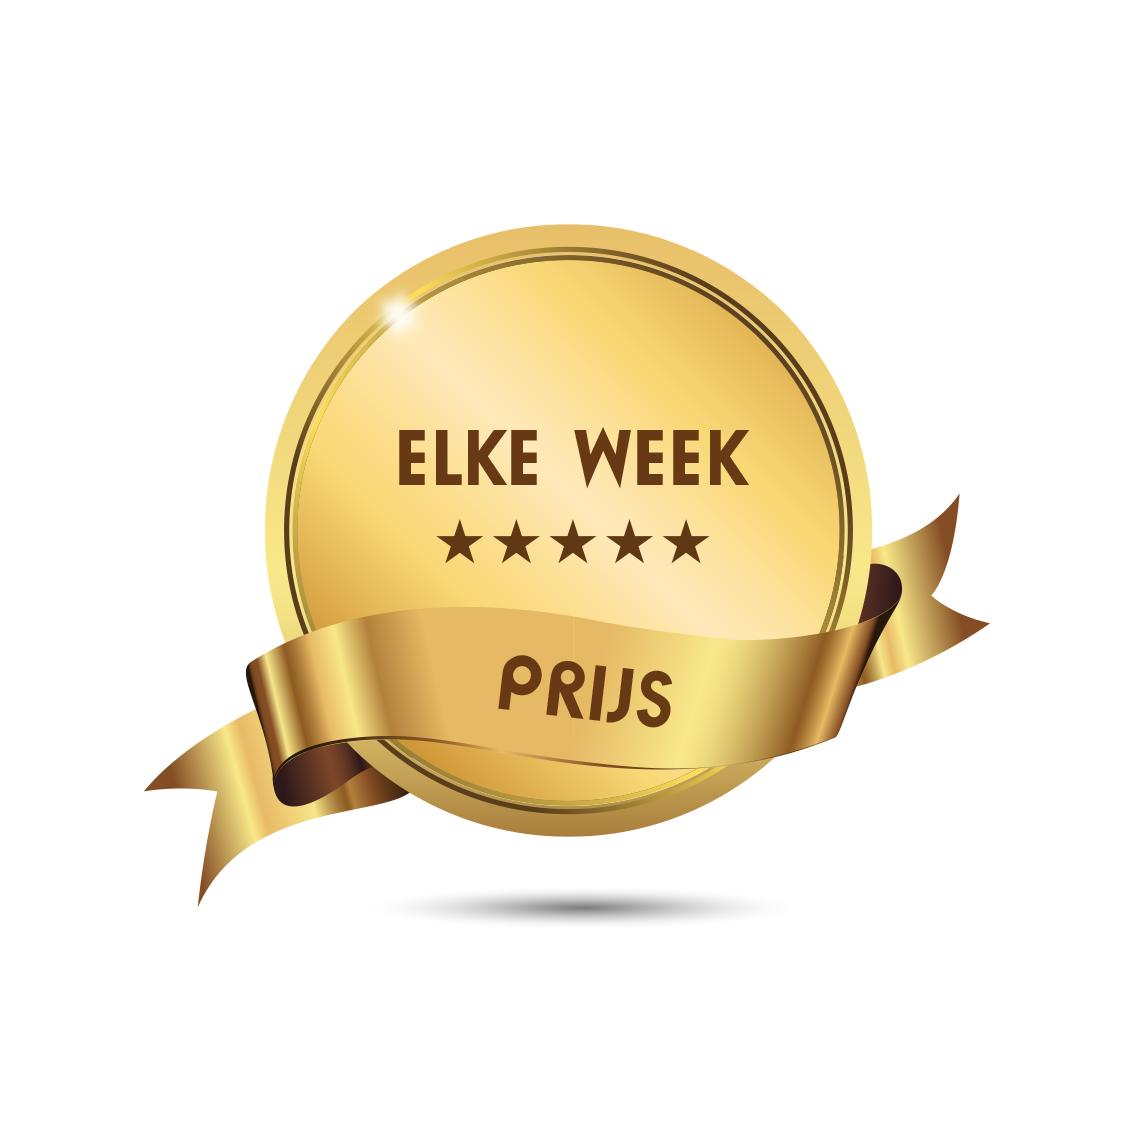 Elke week prijs